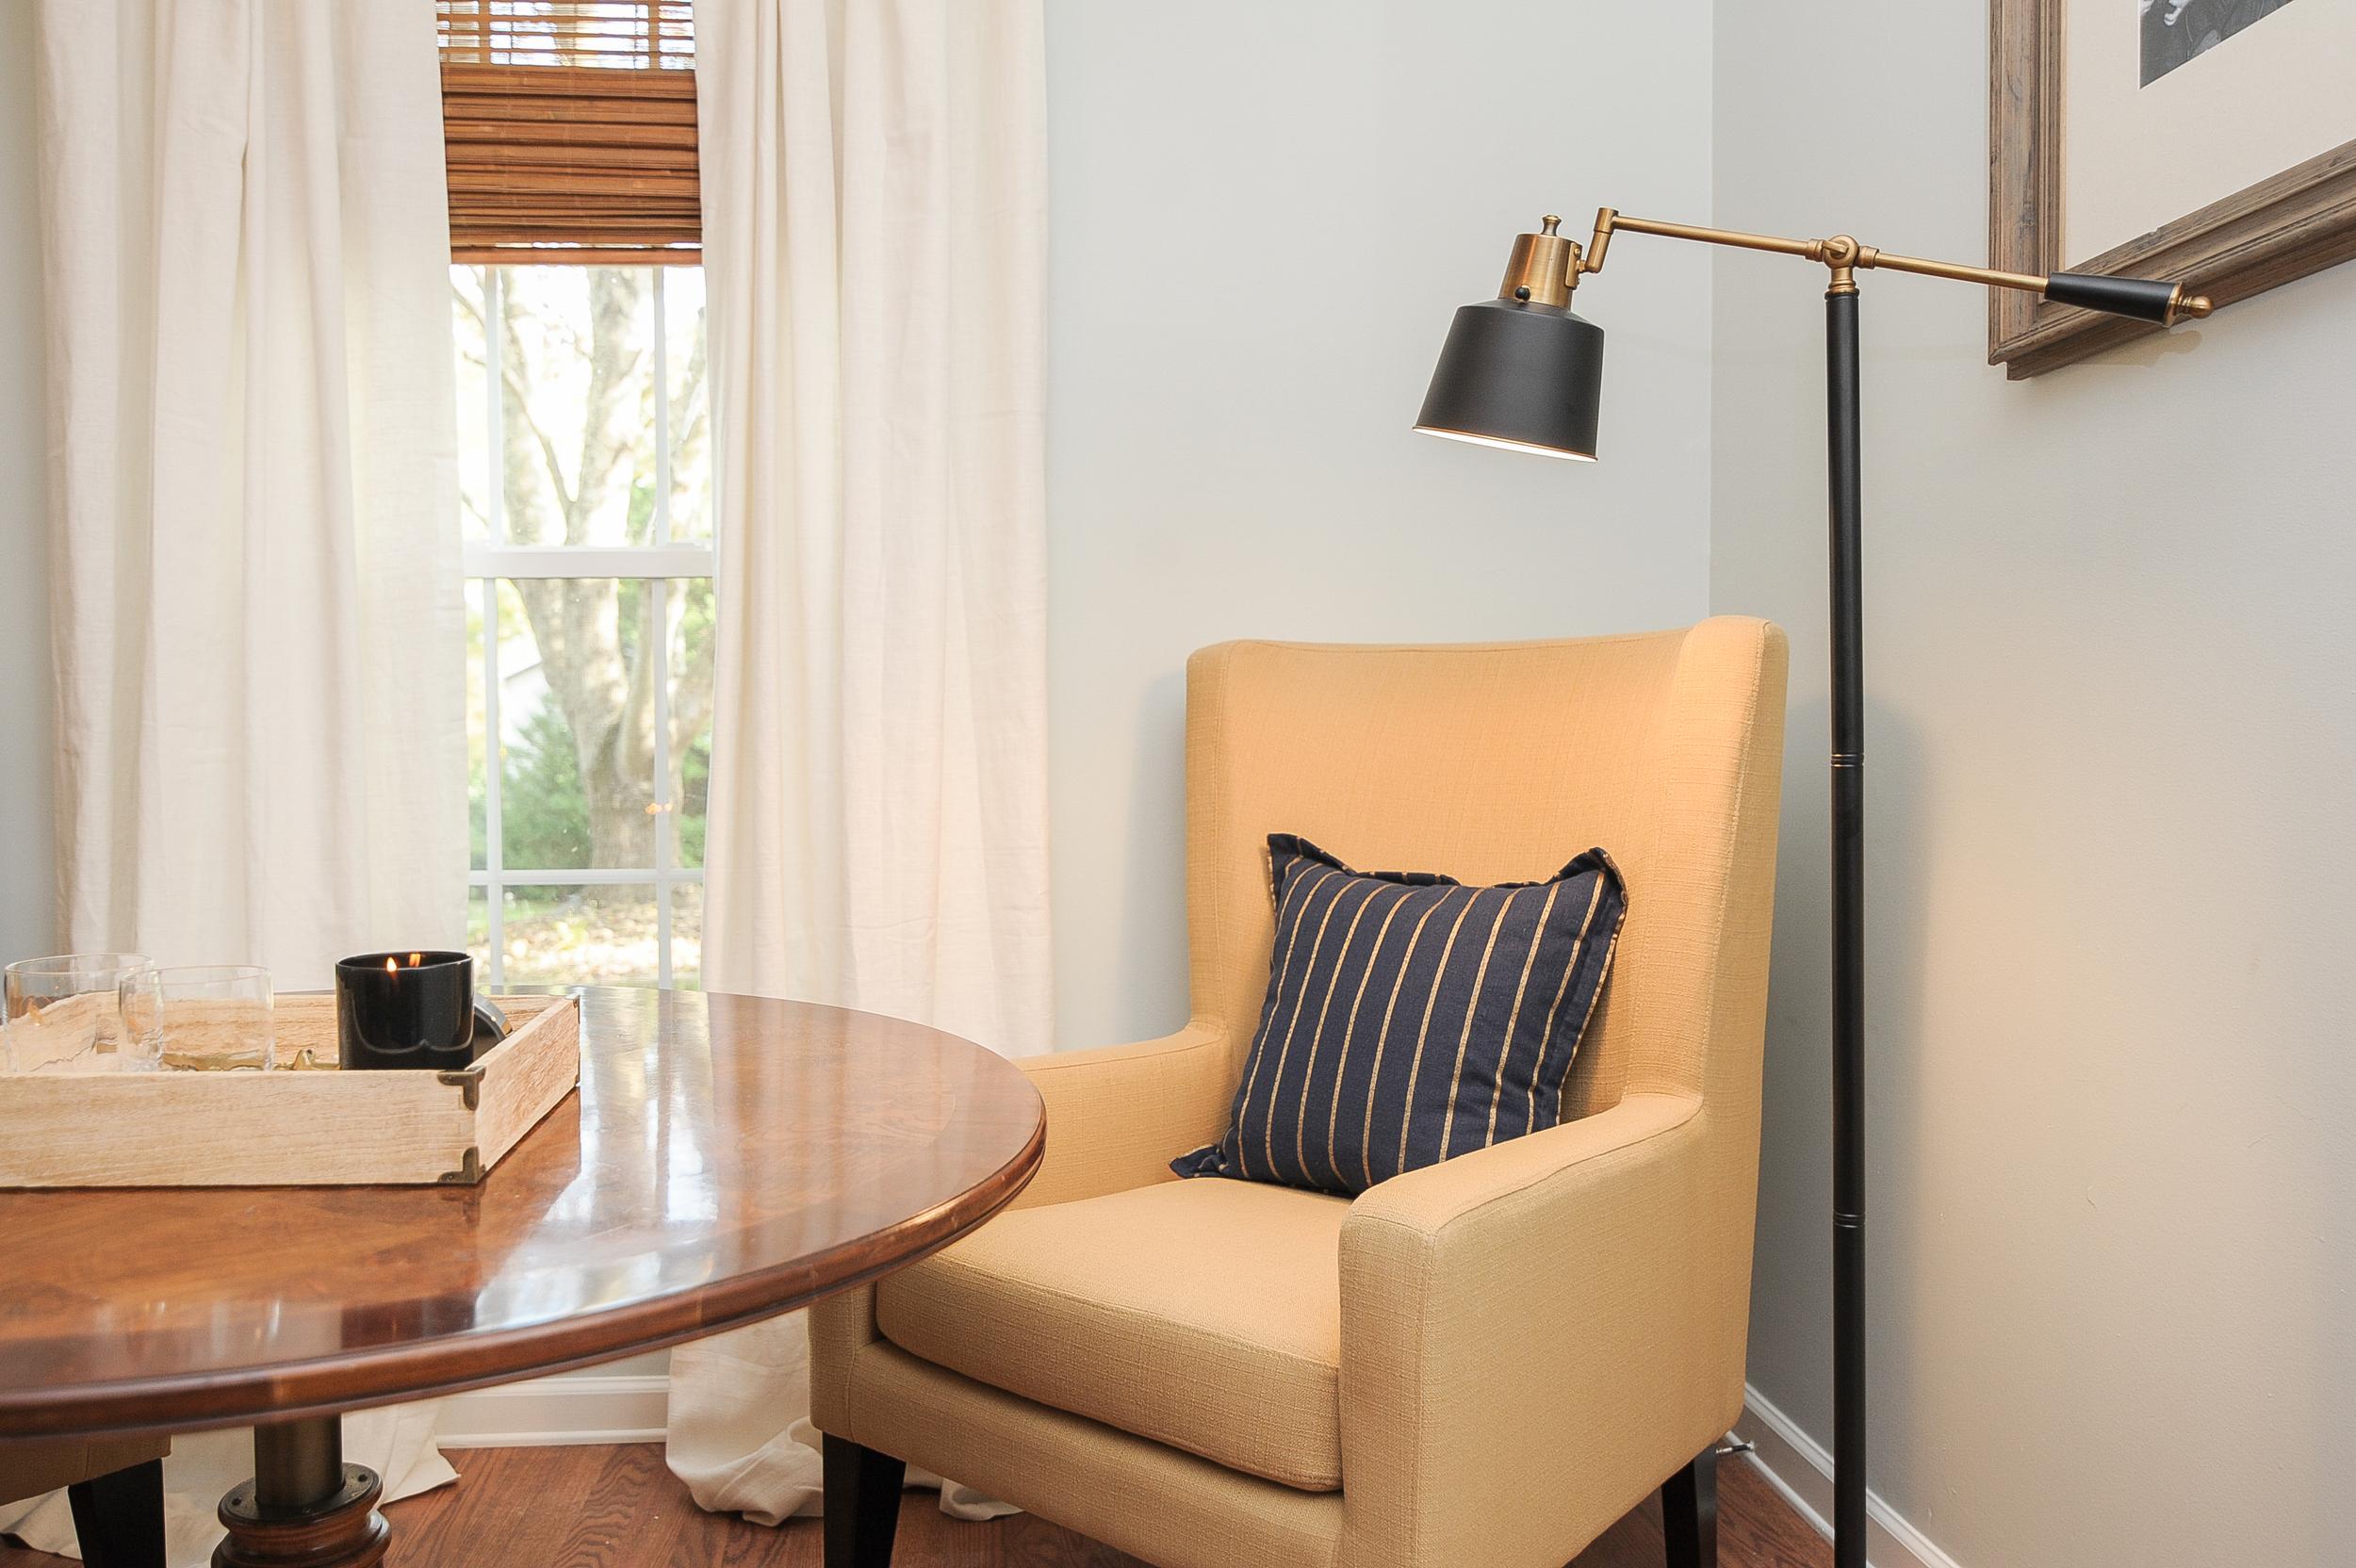 Artful Interiors - Bachelor Pad - Living Room Game Table